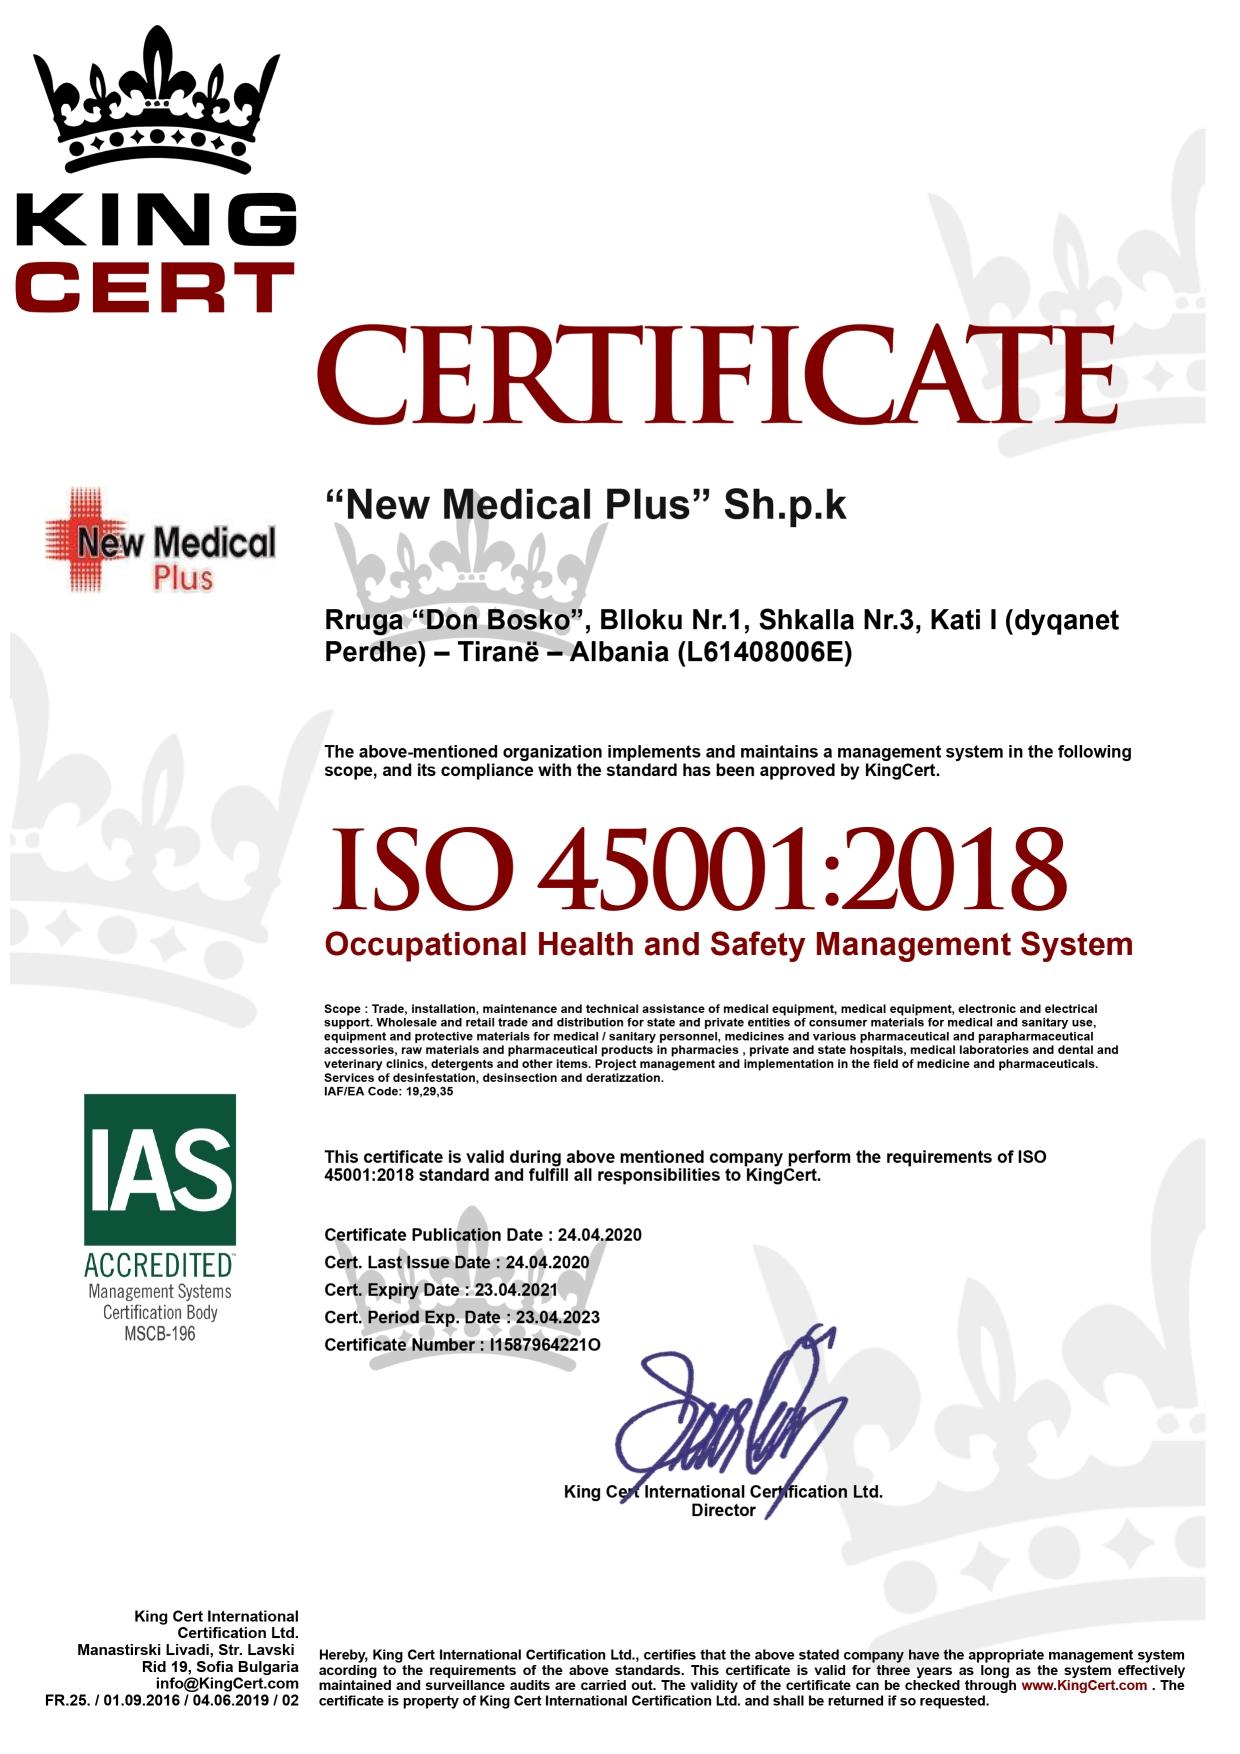 NEW MEDICAL PLUS WEBSITE CERTIFIKATA 10